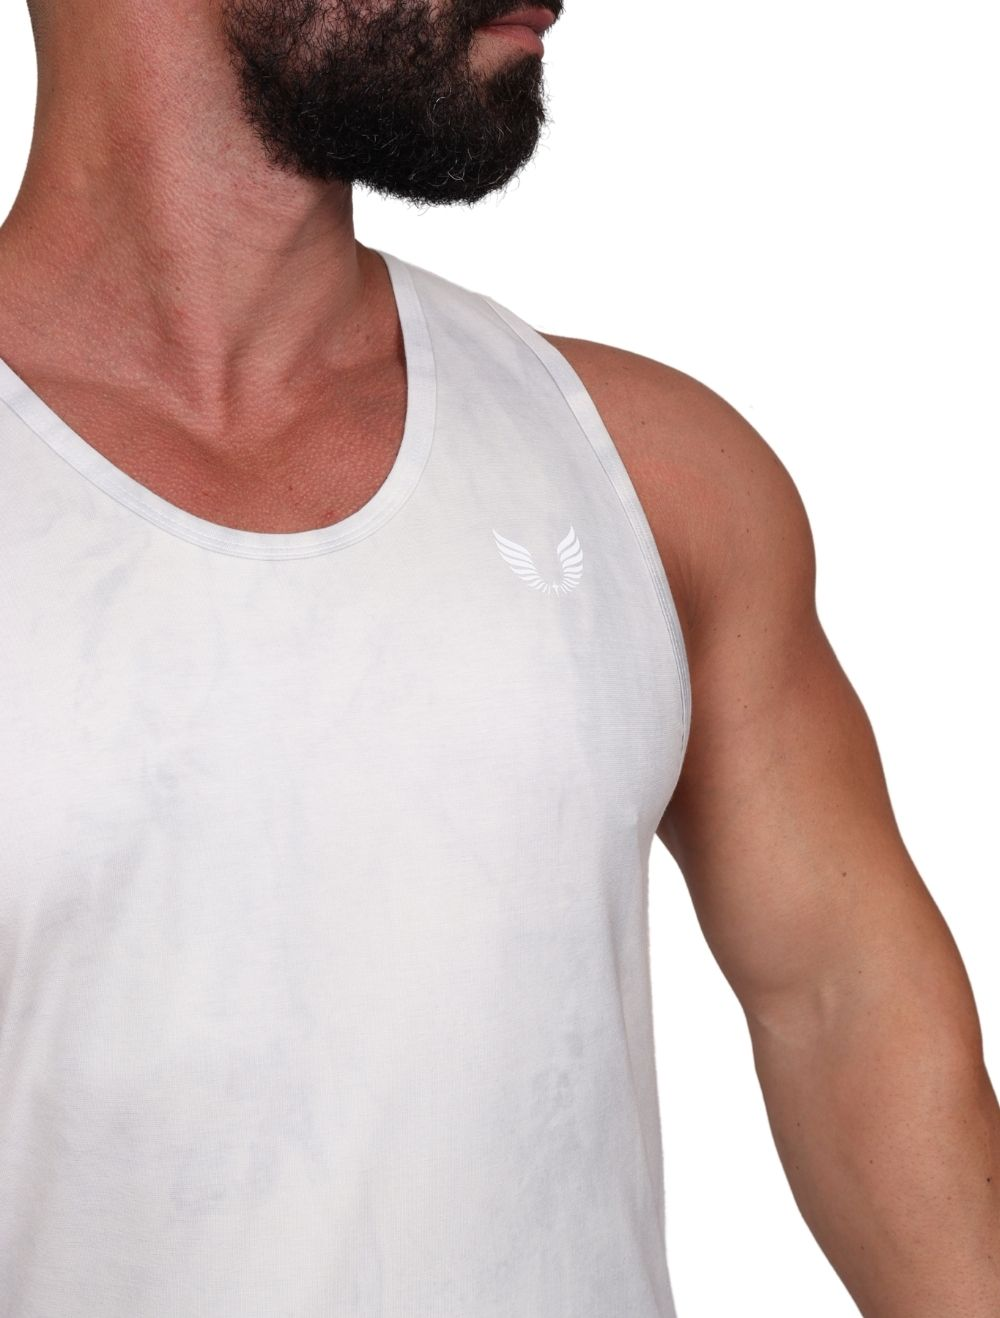 Regata Masculina Slim Com Elastano Tie Dye Preto